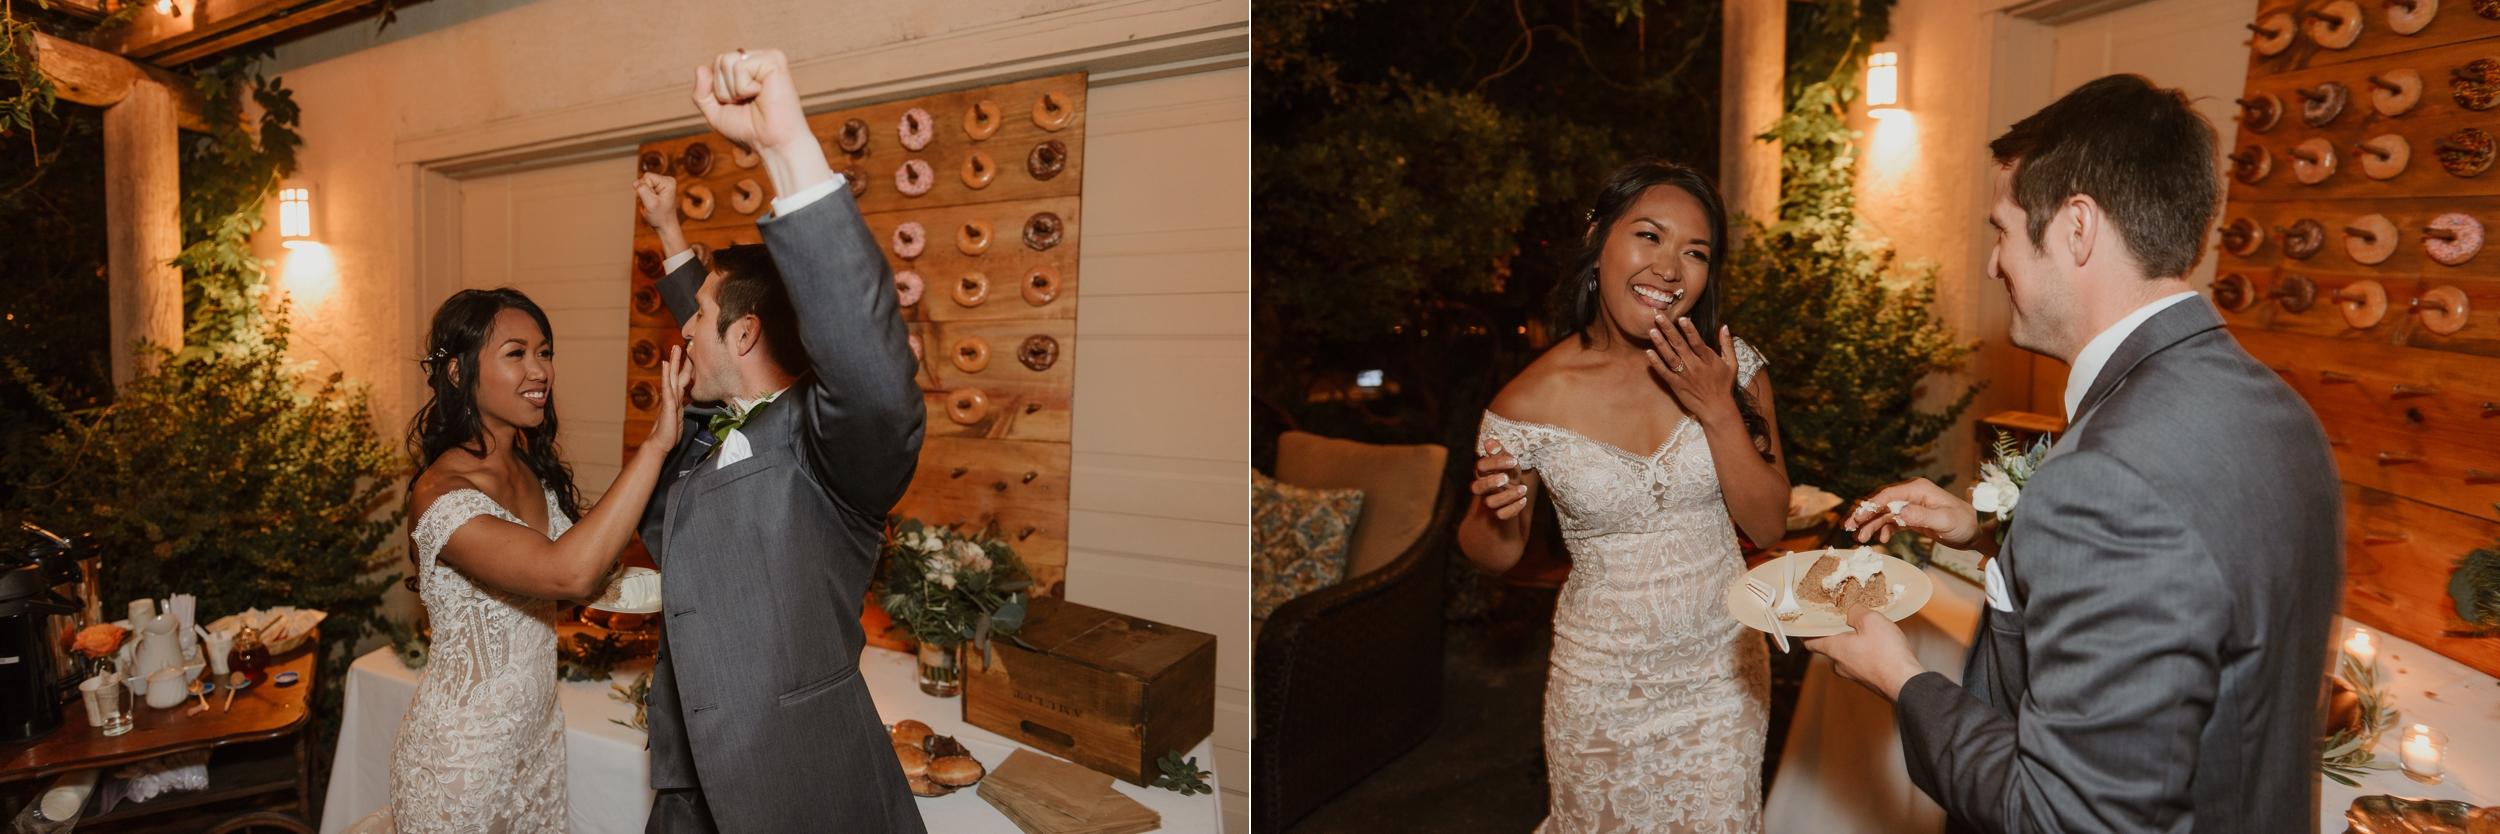 102marin-petaluma-backyard-wedding-vivianchen-618_WEB.jpg